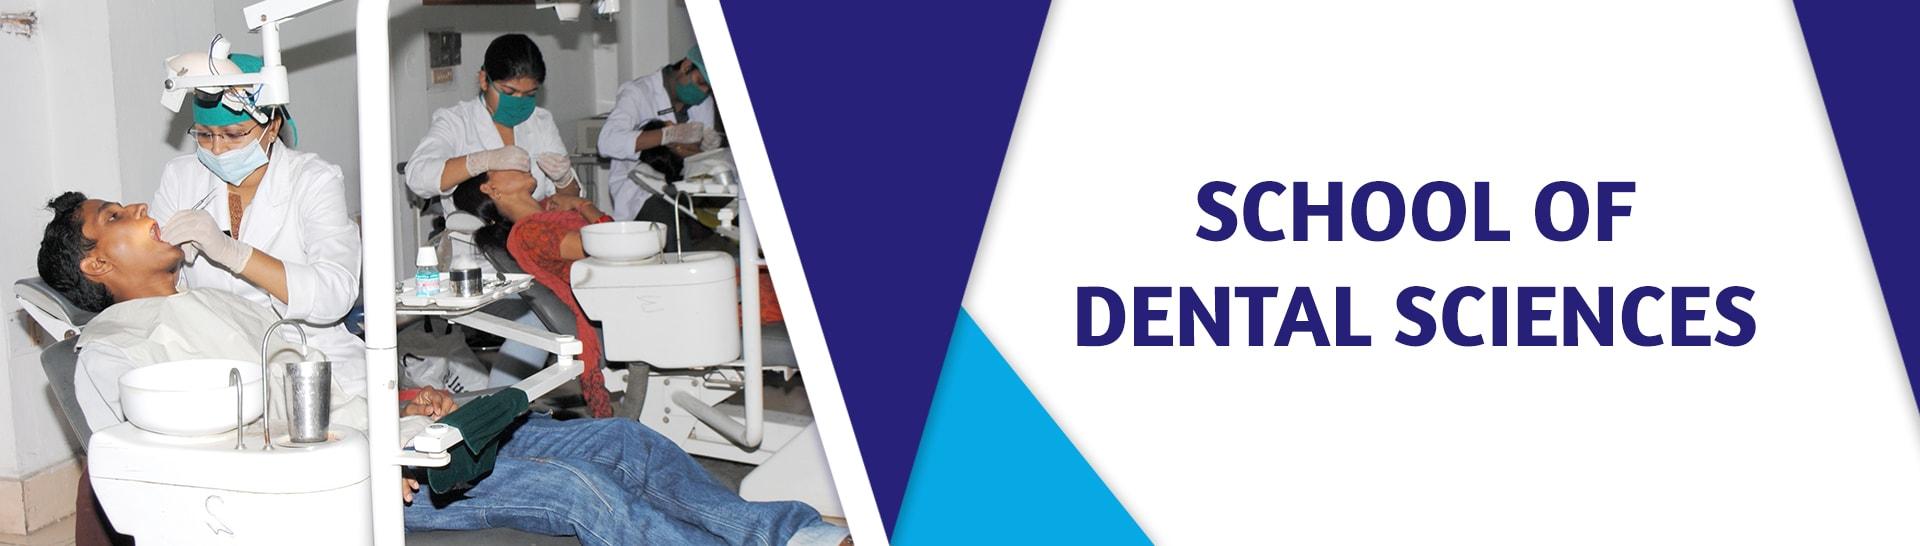 school-of-dental-sciences